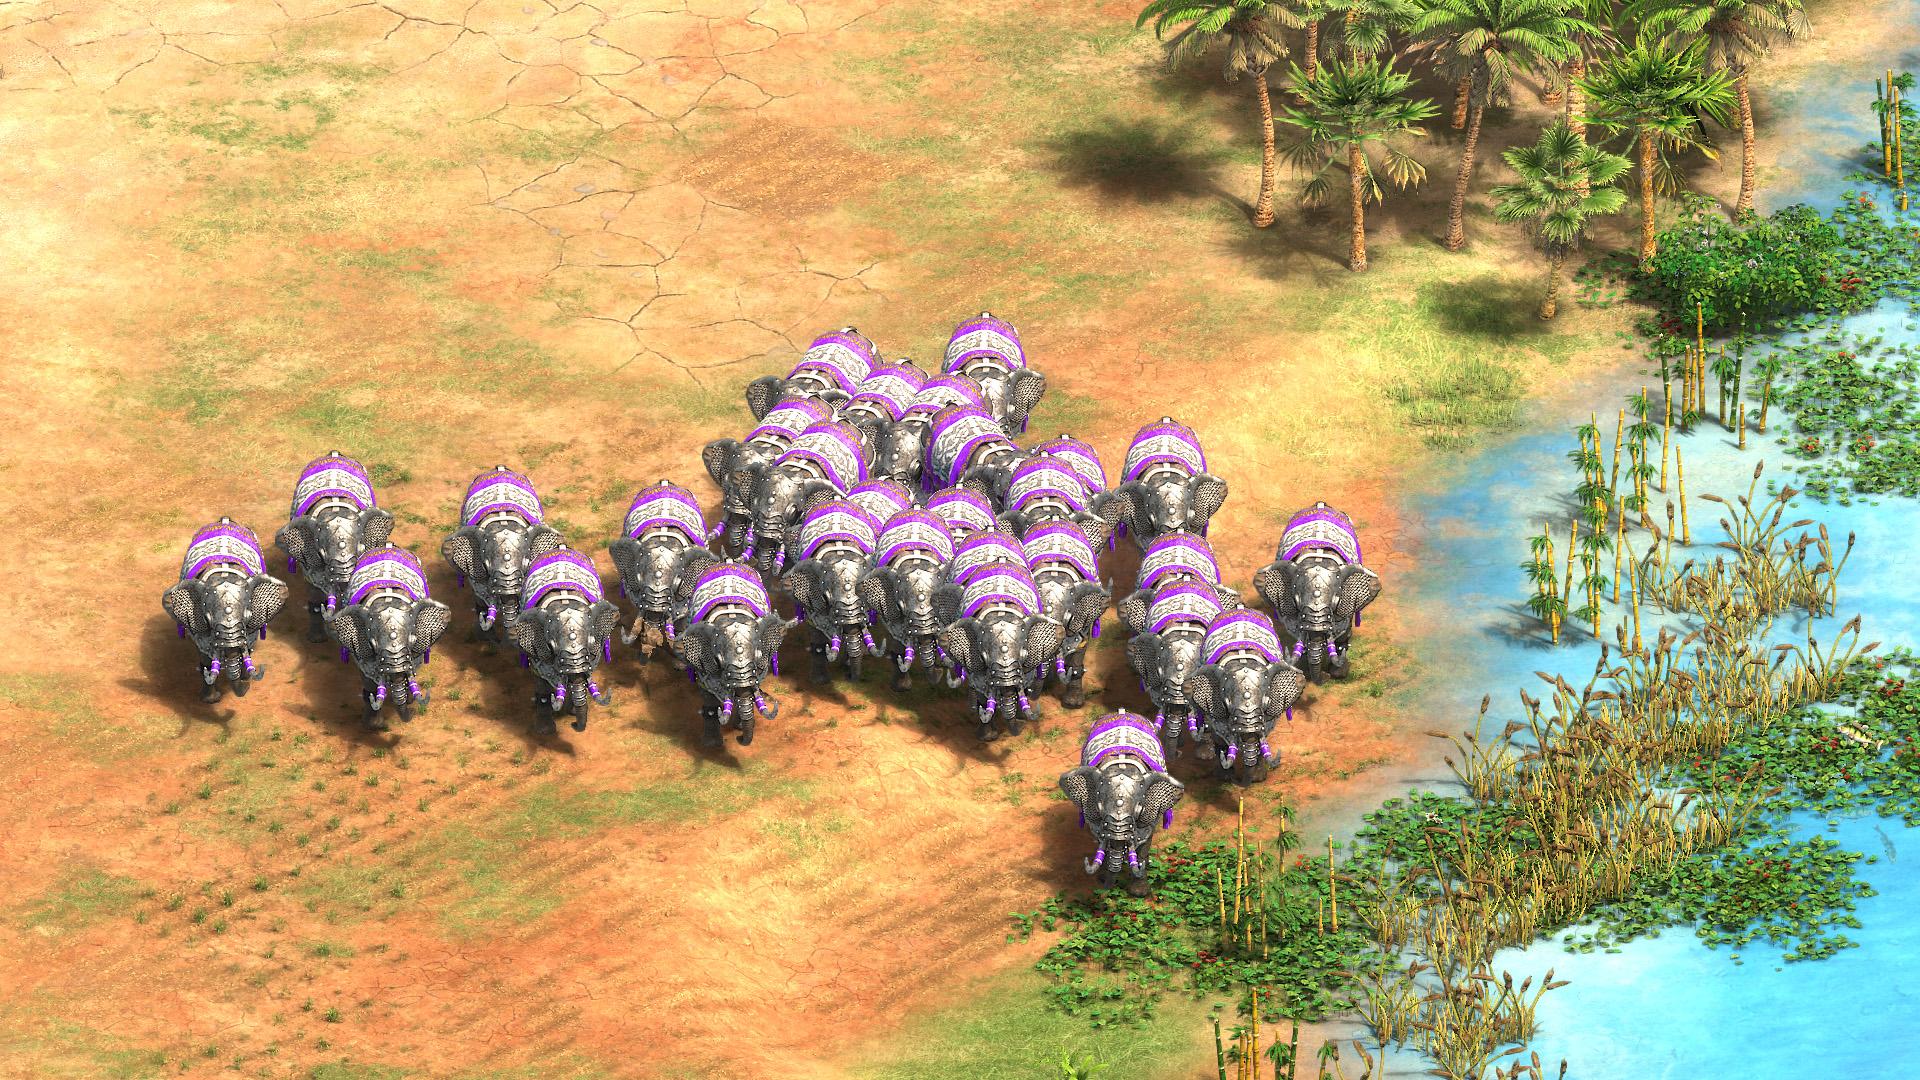 https://www.forgottenempires.net/wp-content/uploads/age-of-empires-2-de-persian-war-elephants.jpg